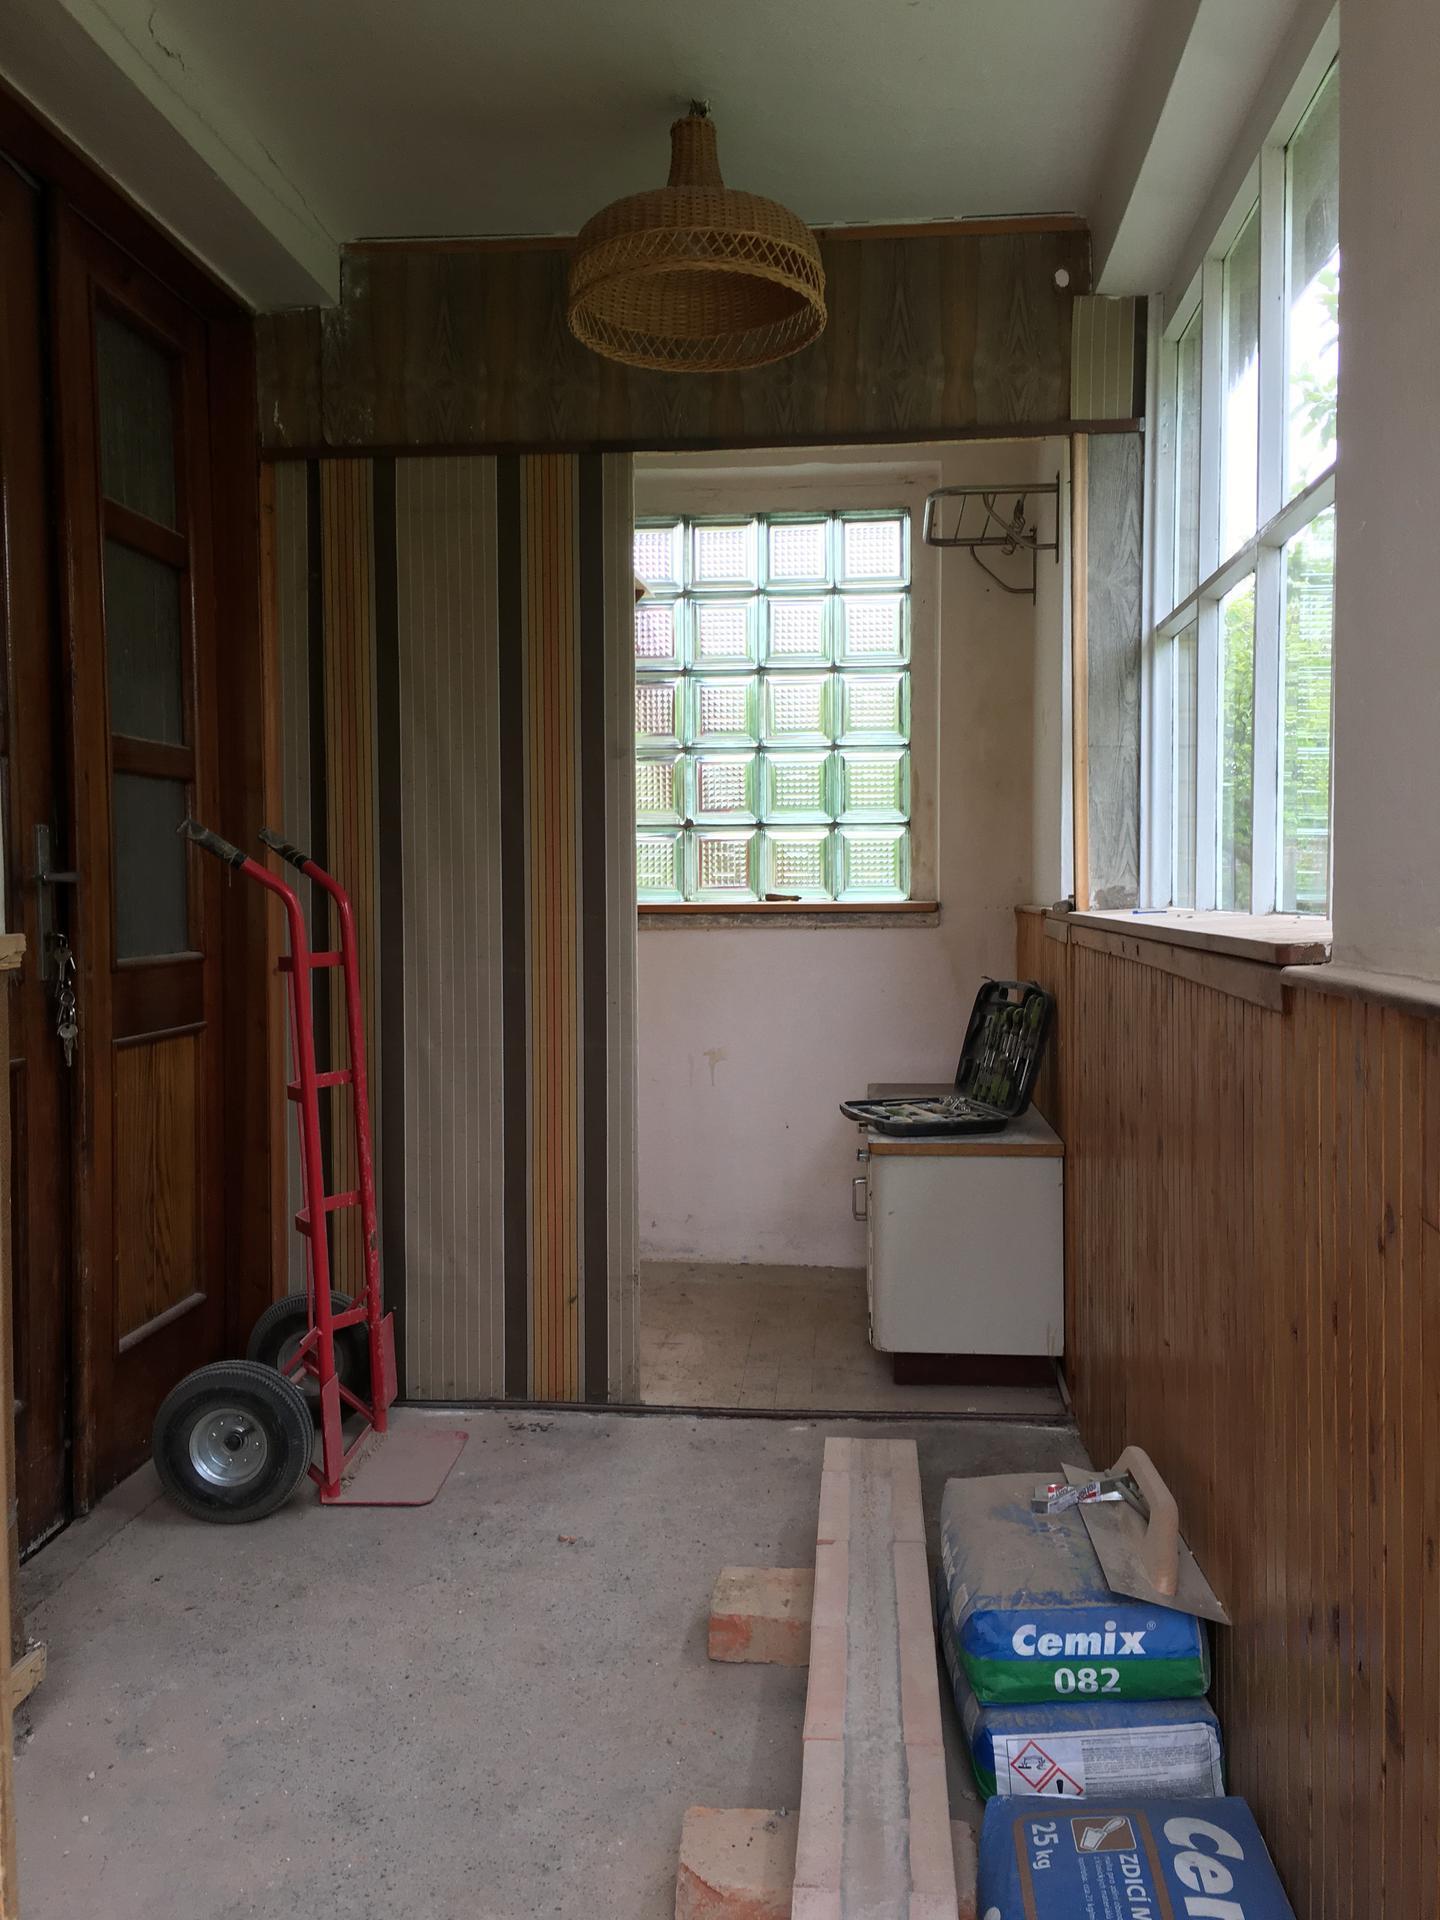 Rekonstrukce 🏡 20/21 - Demolice verandy